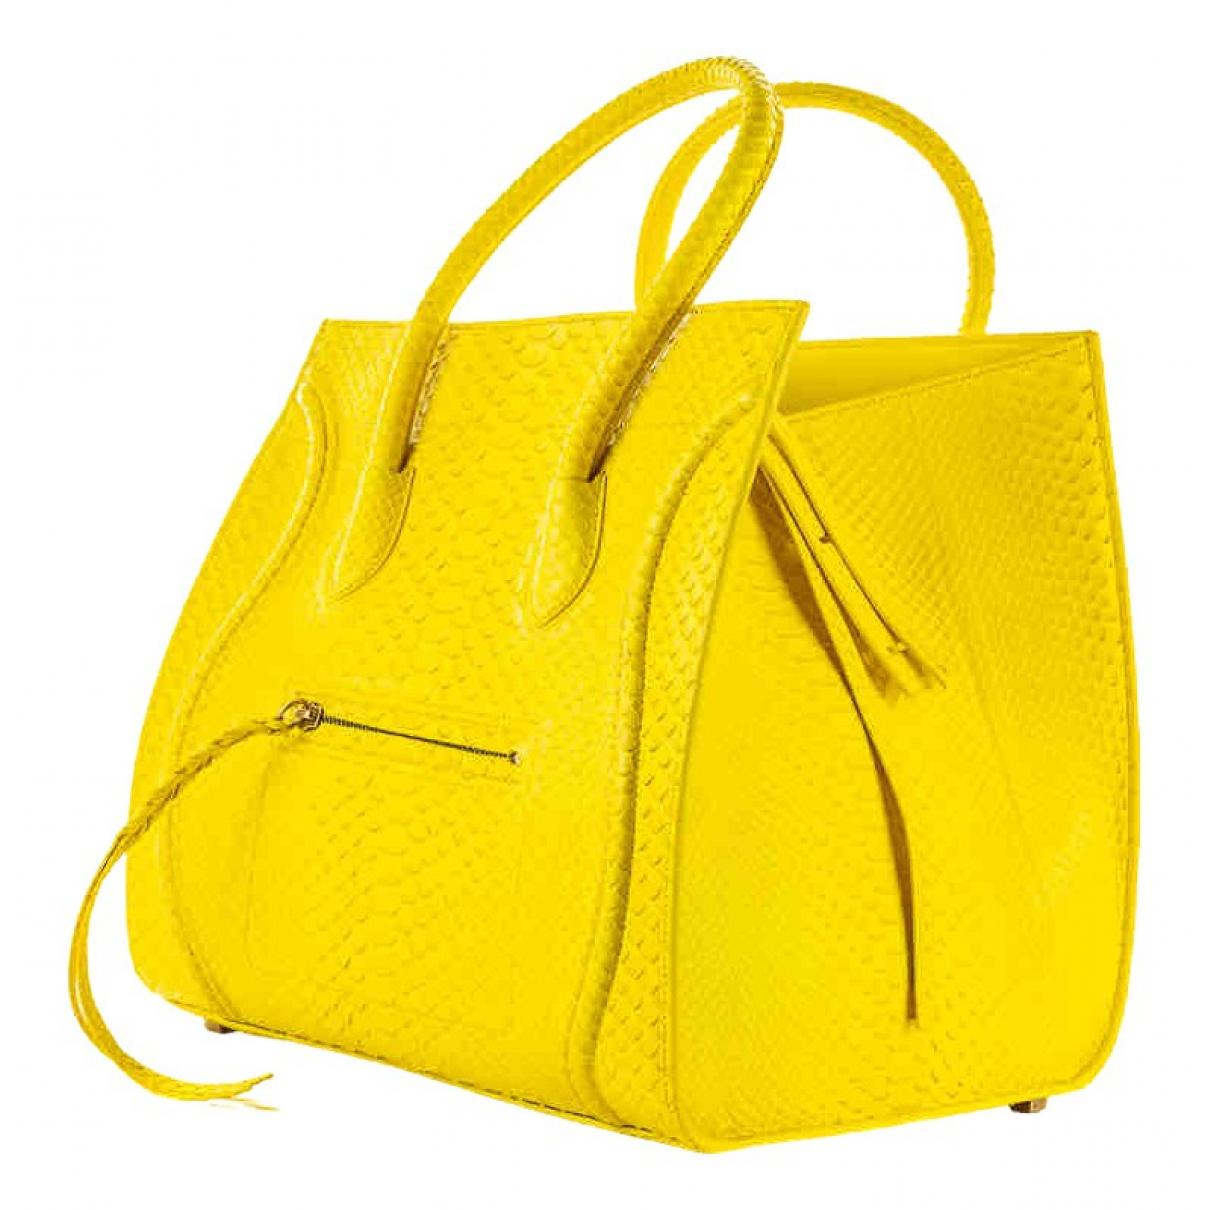 Celine Luggage Phantom Yellow Python handbag for Women \N